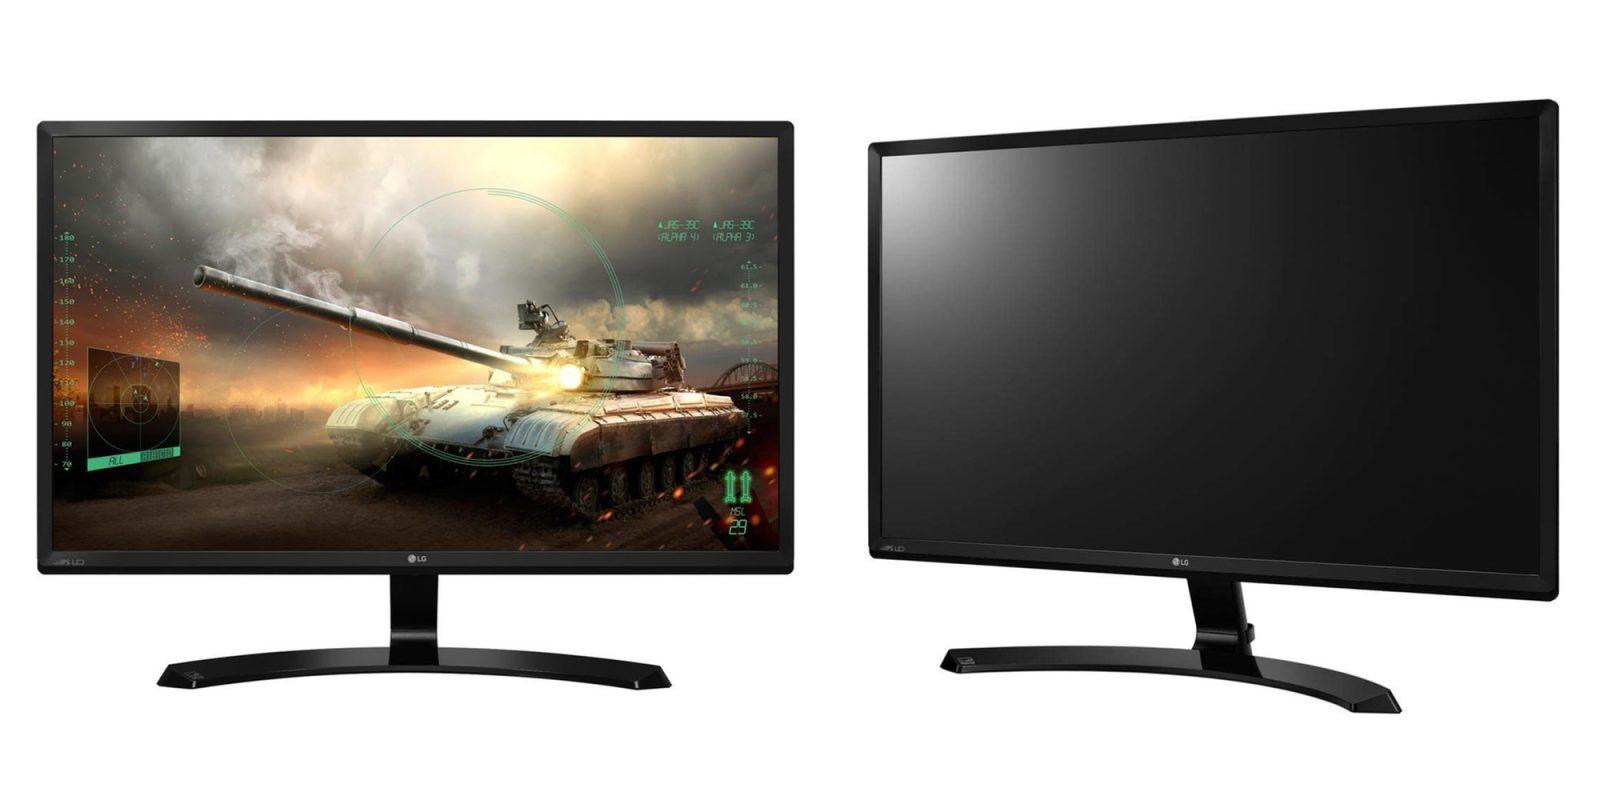 lg-27-inch-27mp59htp-monitor.jpg